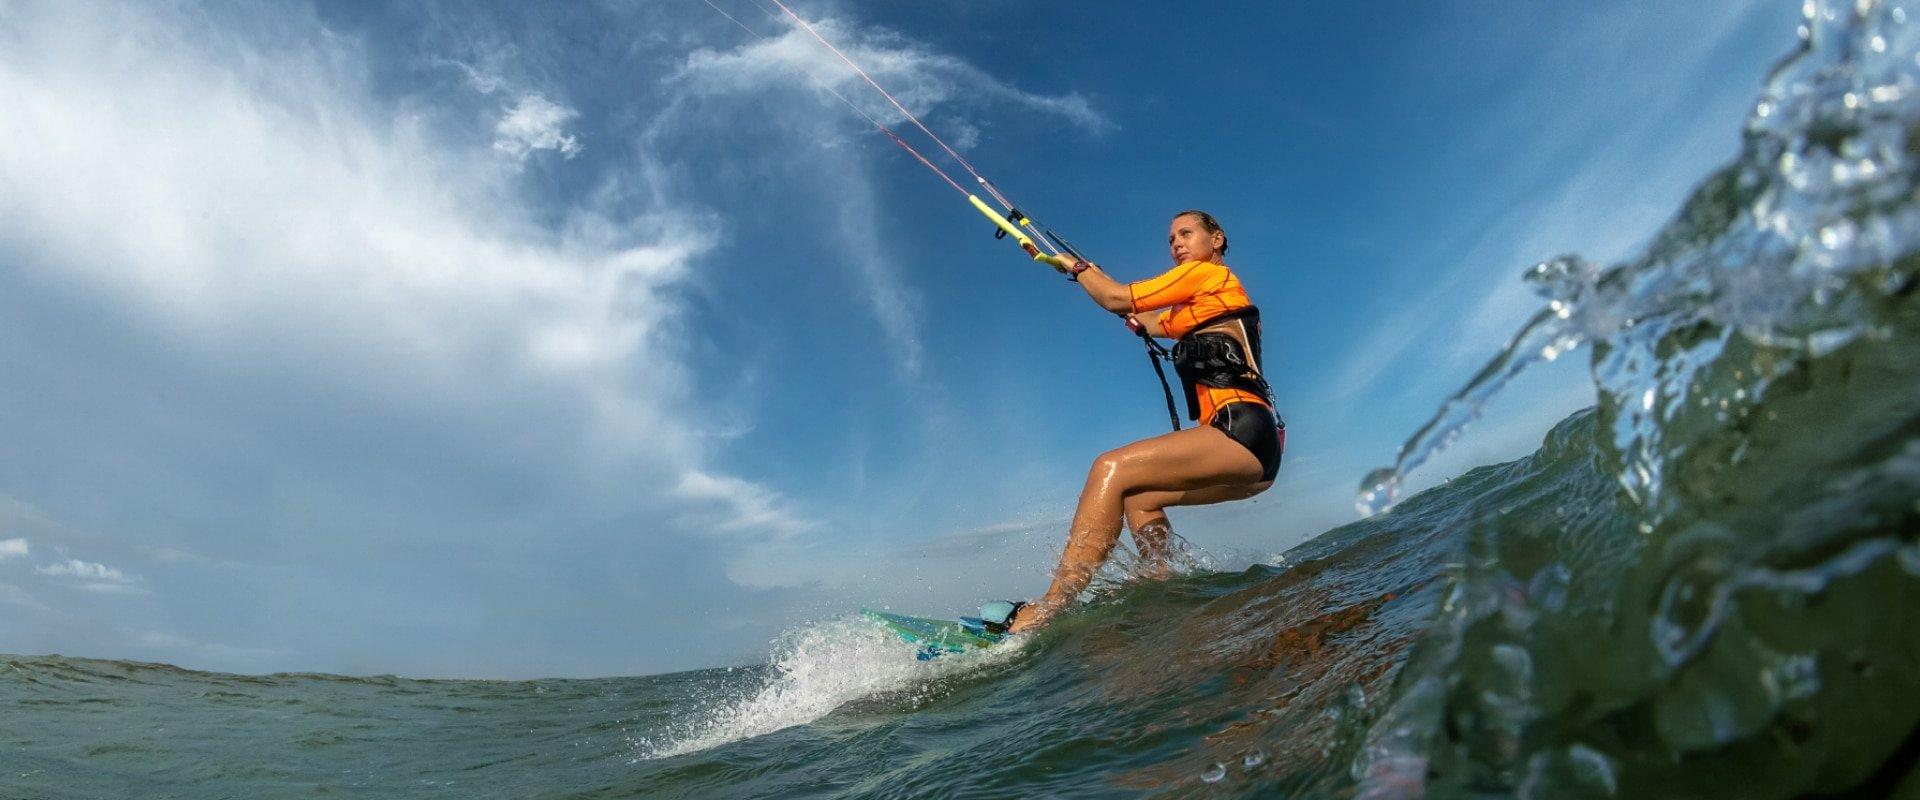 Kite-surf in warm waters